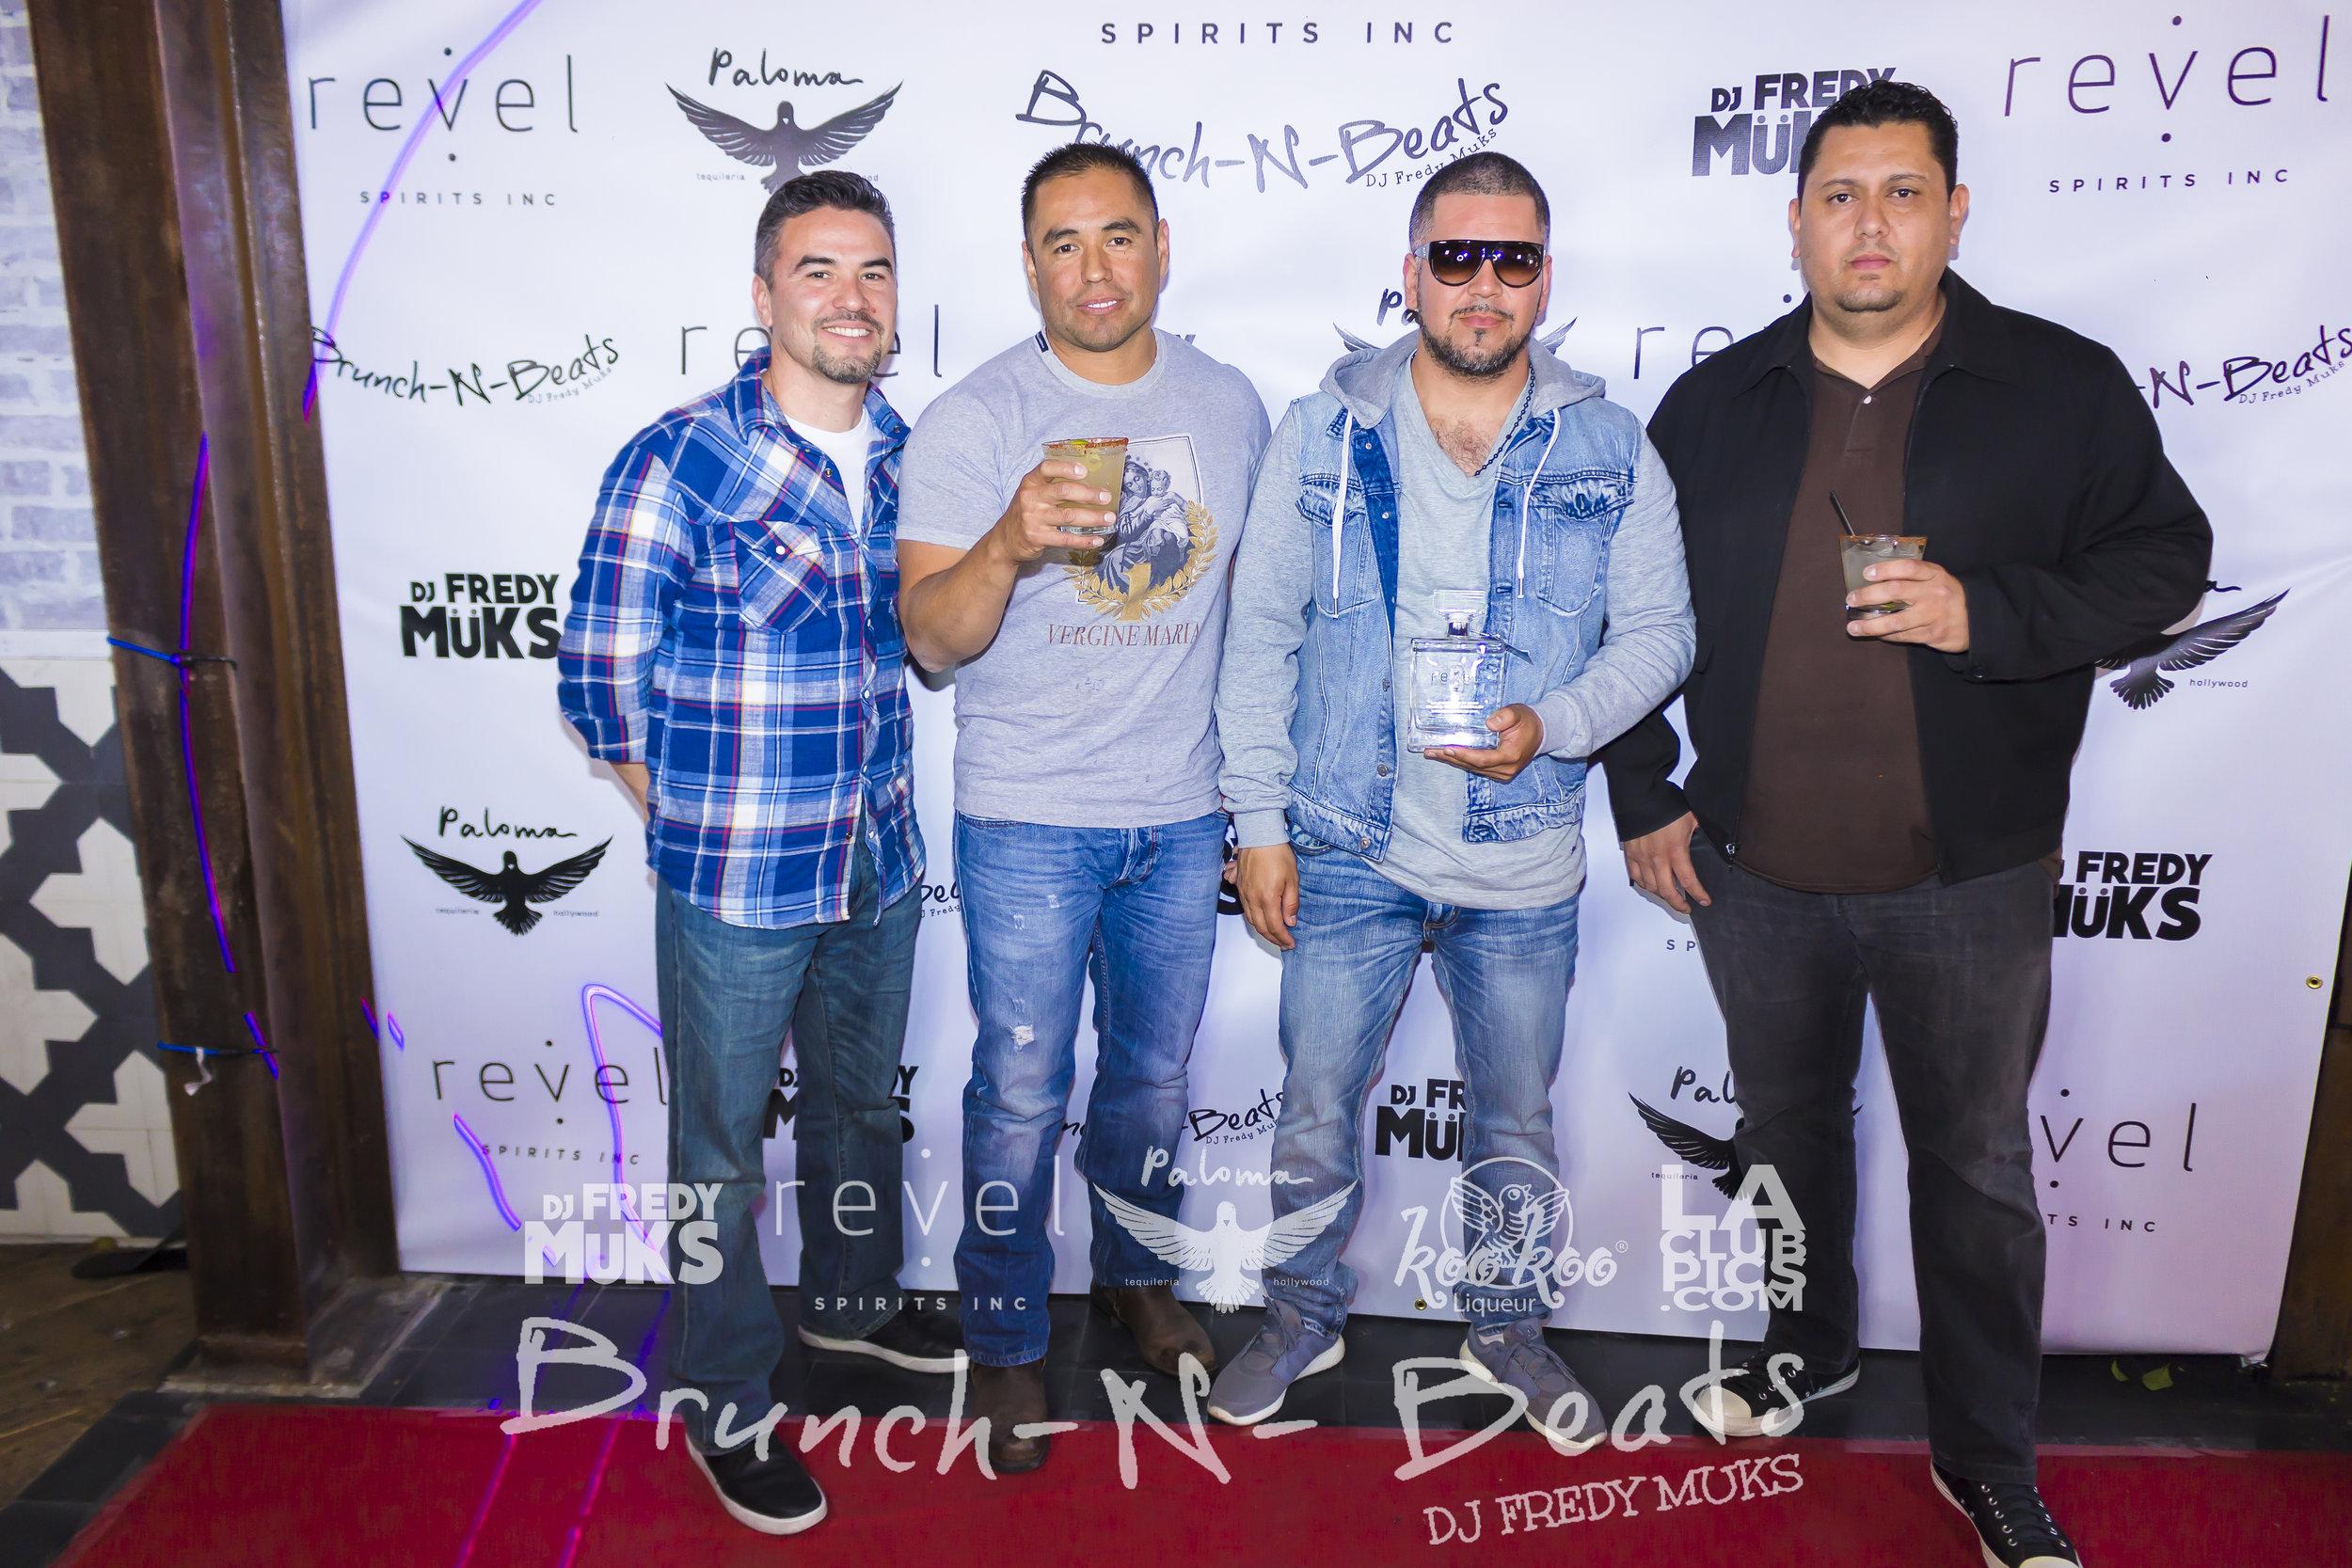 Brunch-N-Beats - Paloma Hollywood - 02-25-18_57.jpg